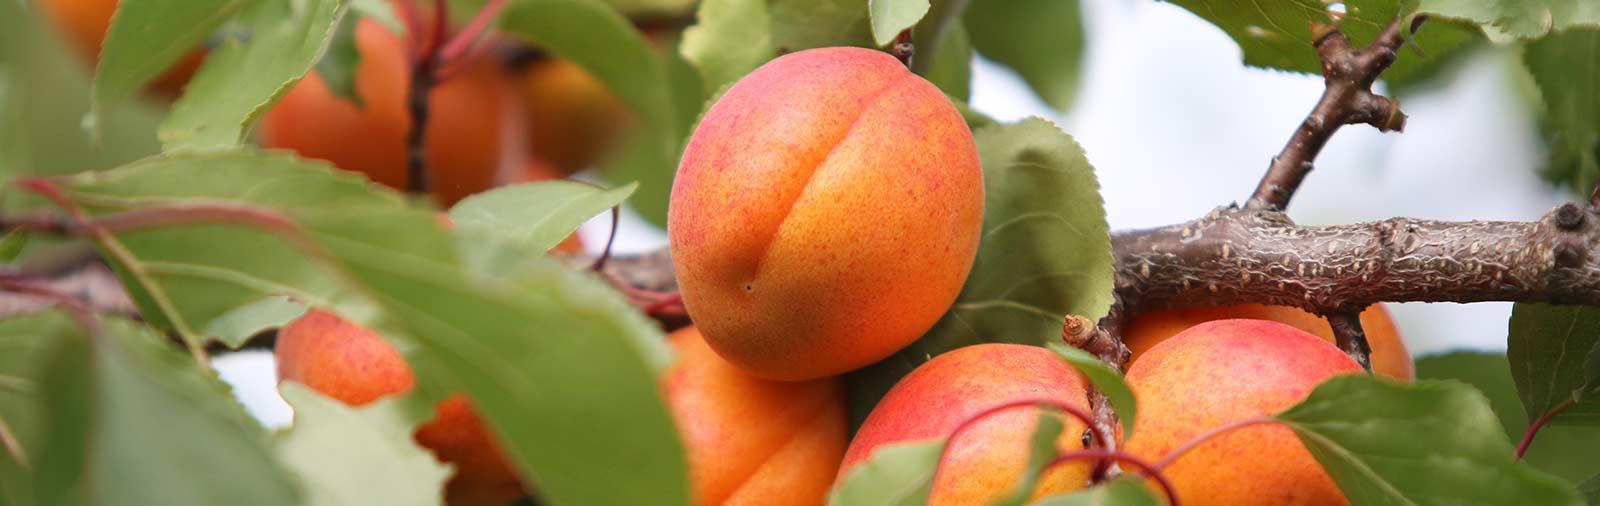 Abrikoos - Prunus armeniaca L.